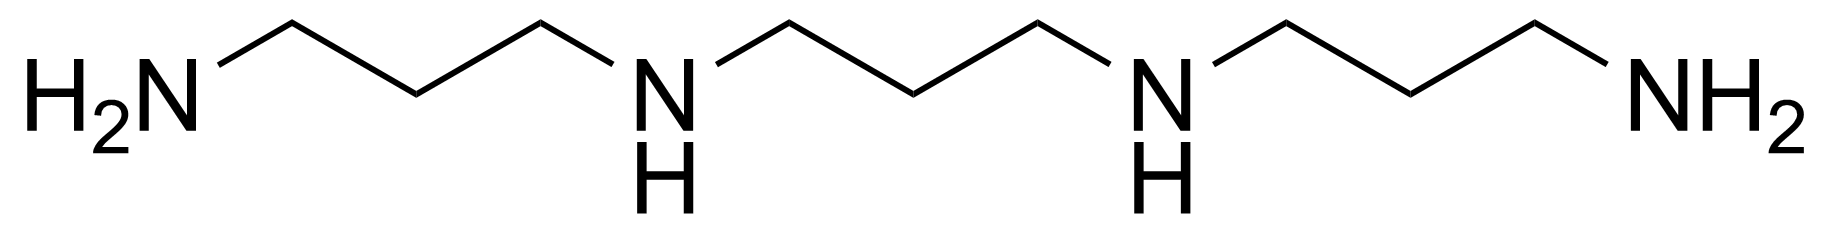 Structure of N,N'-Bis(3-aminopropyl)-1,3-propanediamine